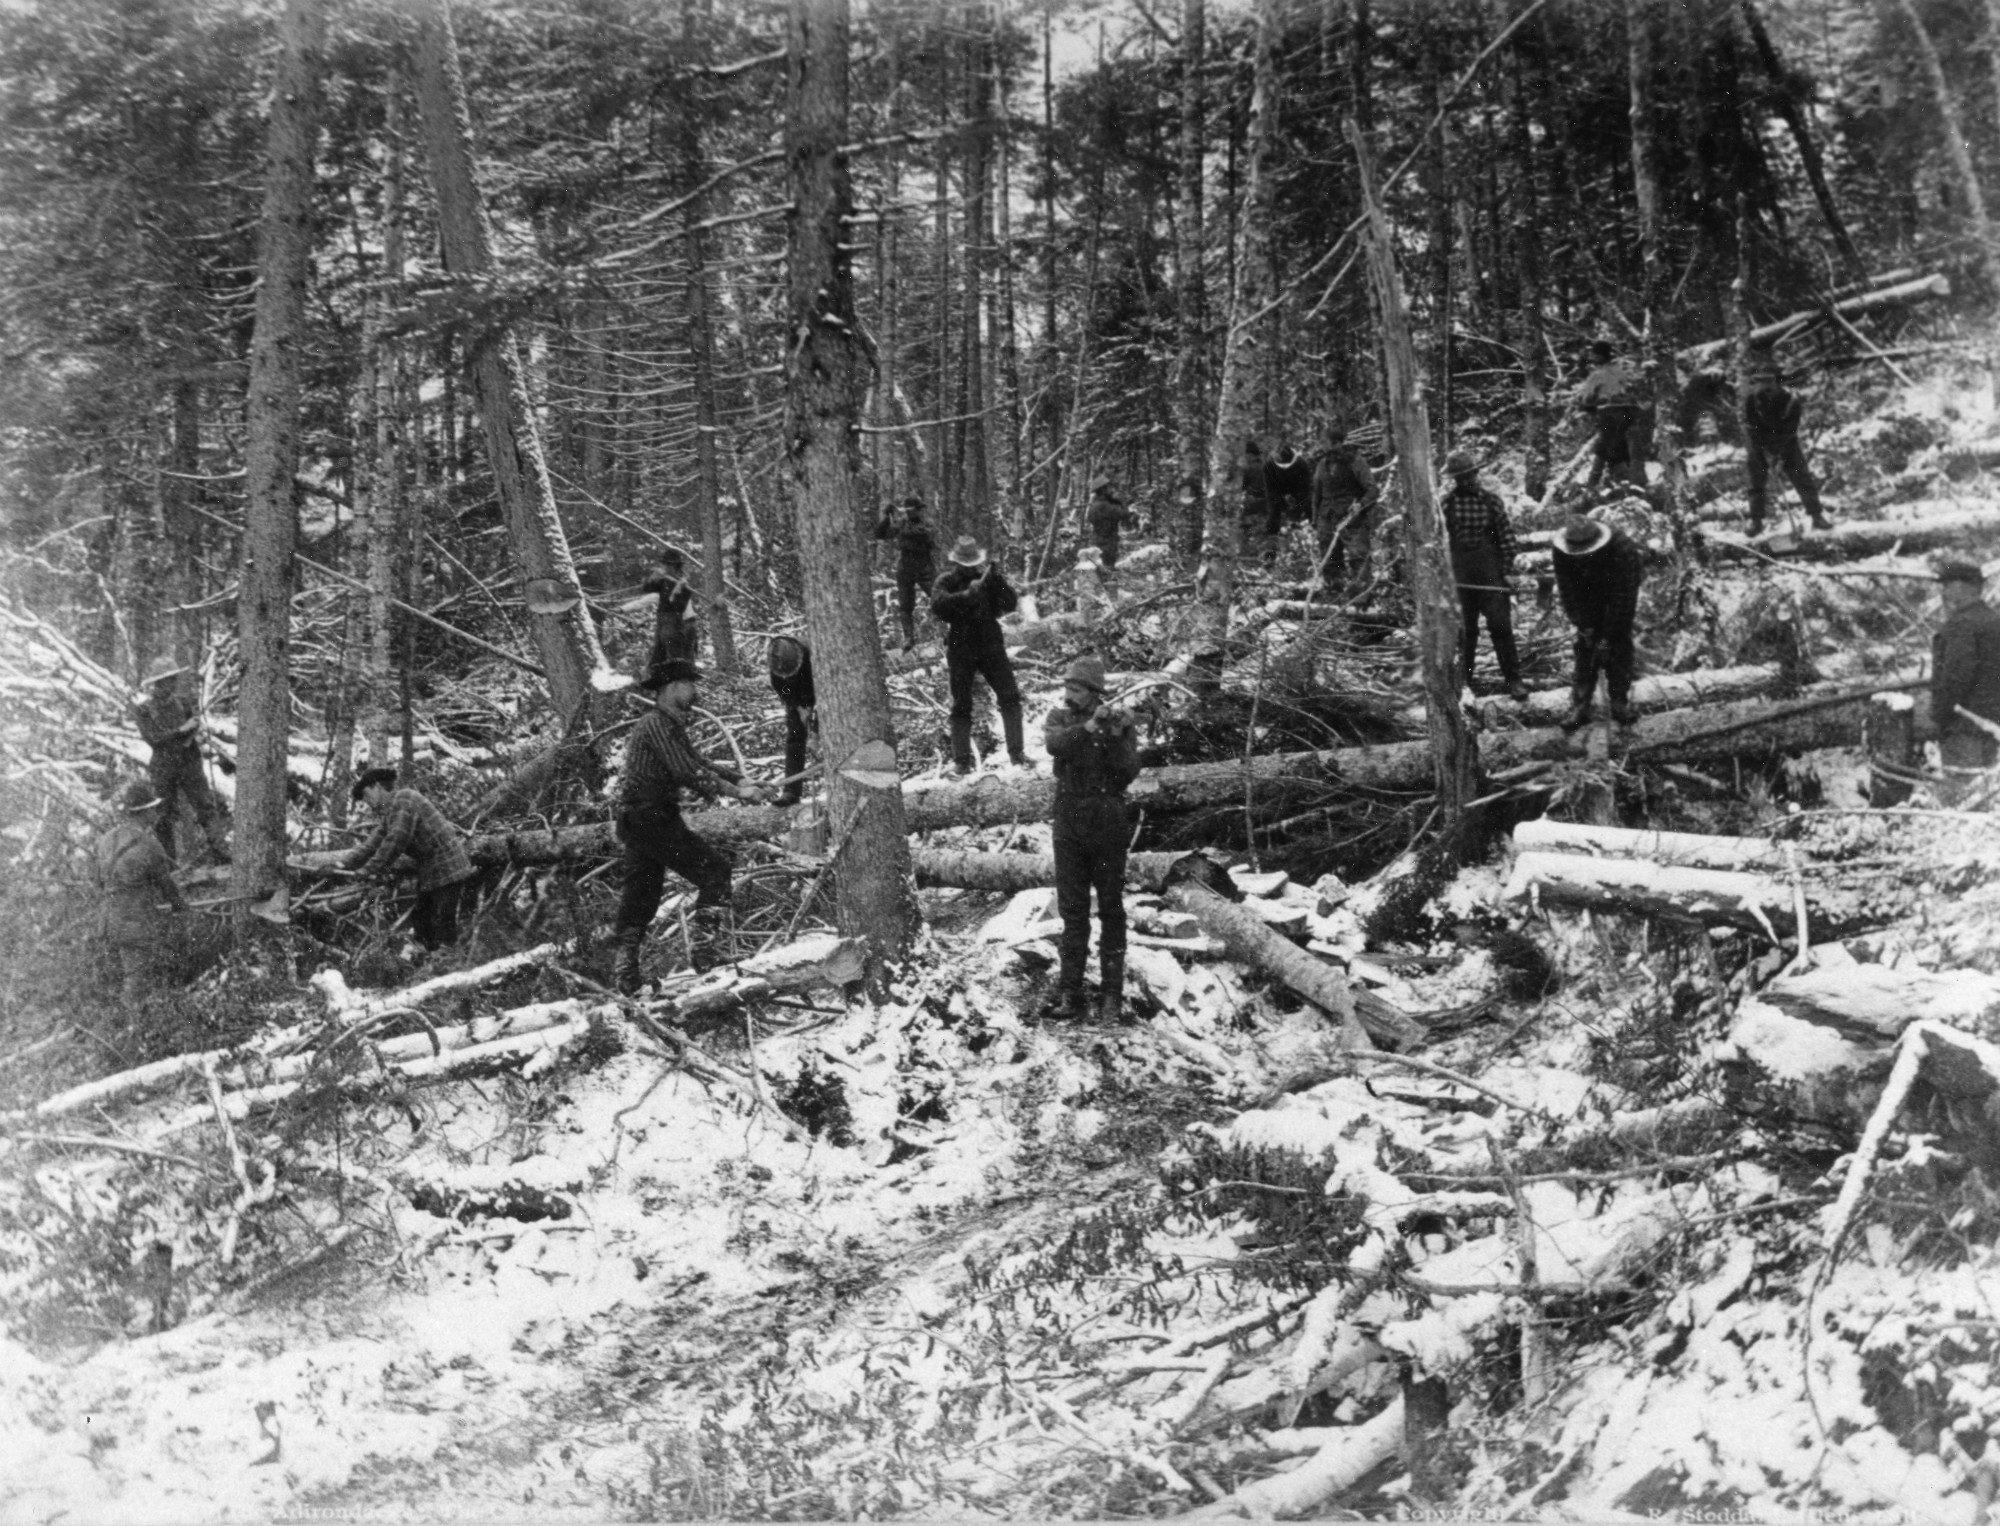 lumbermen felling and limbing